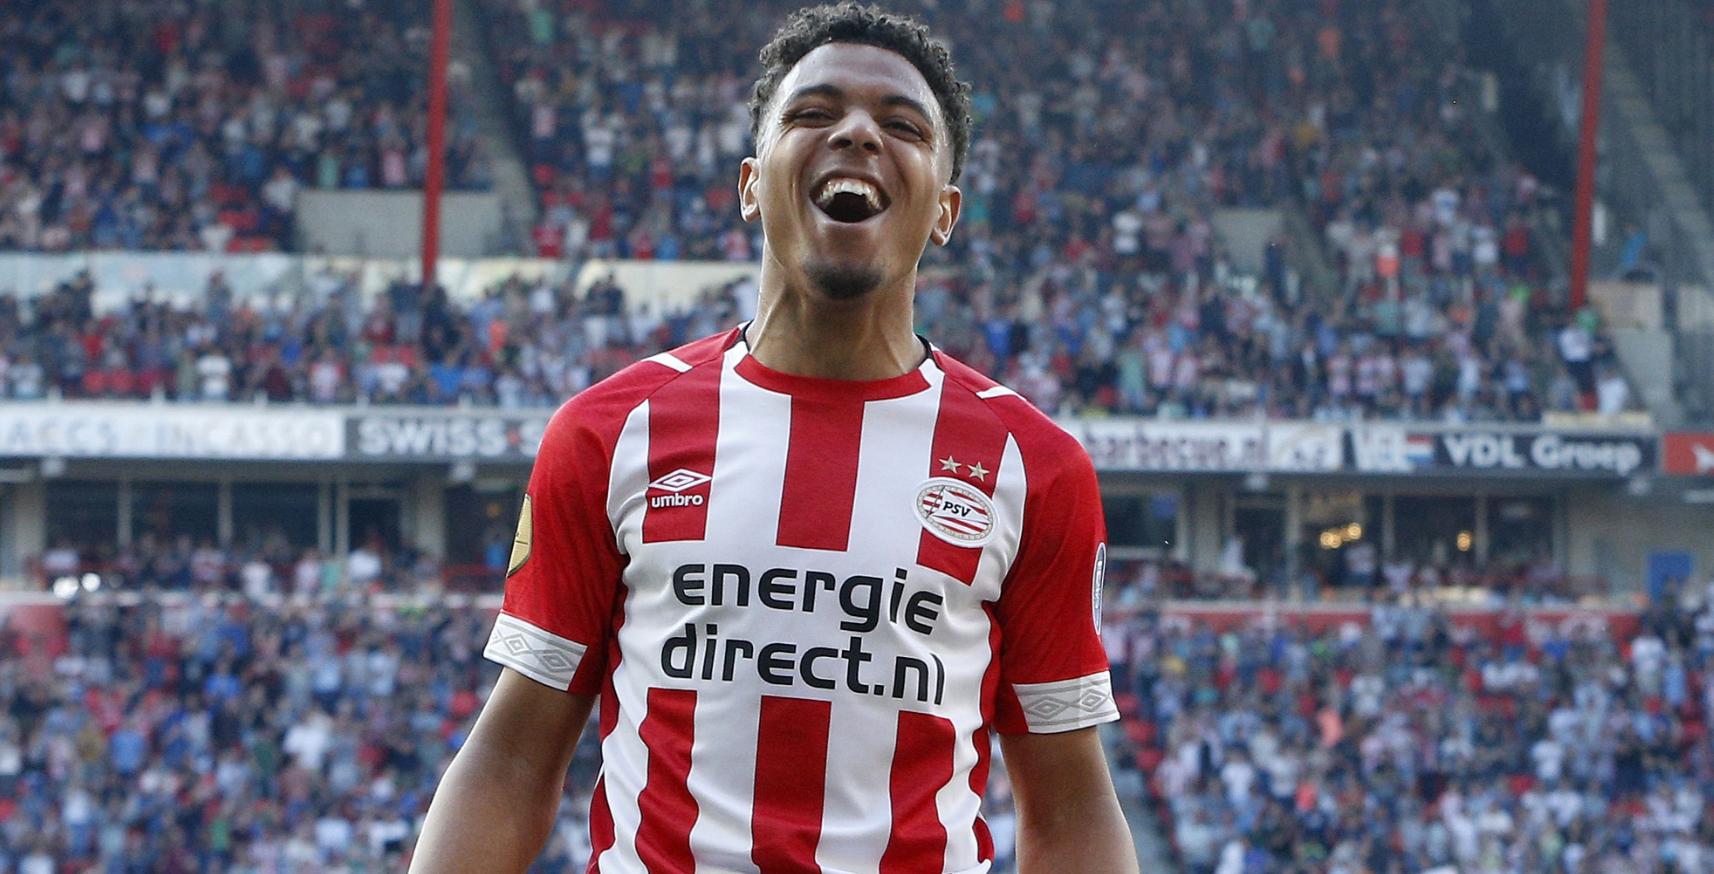 Ex-Arsenal forward Malen scores five goals for PSV